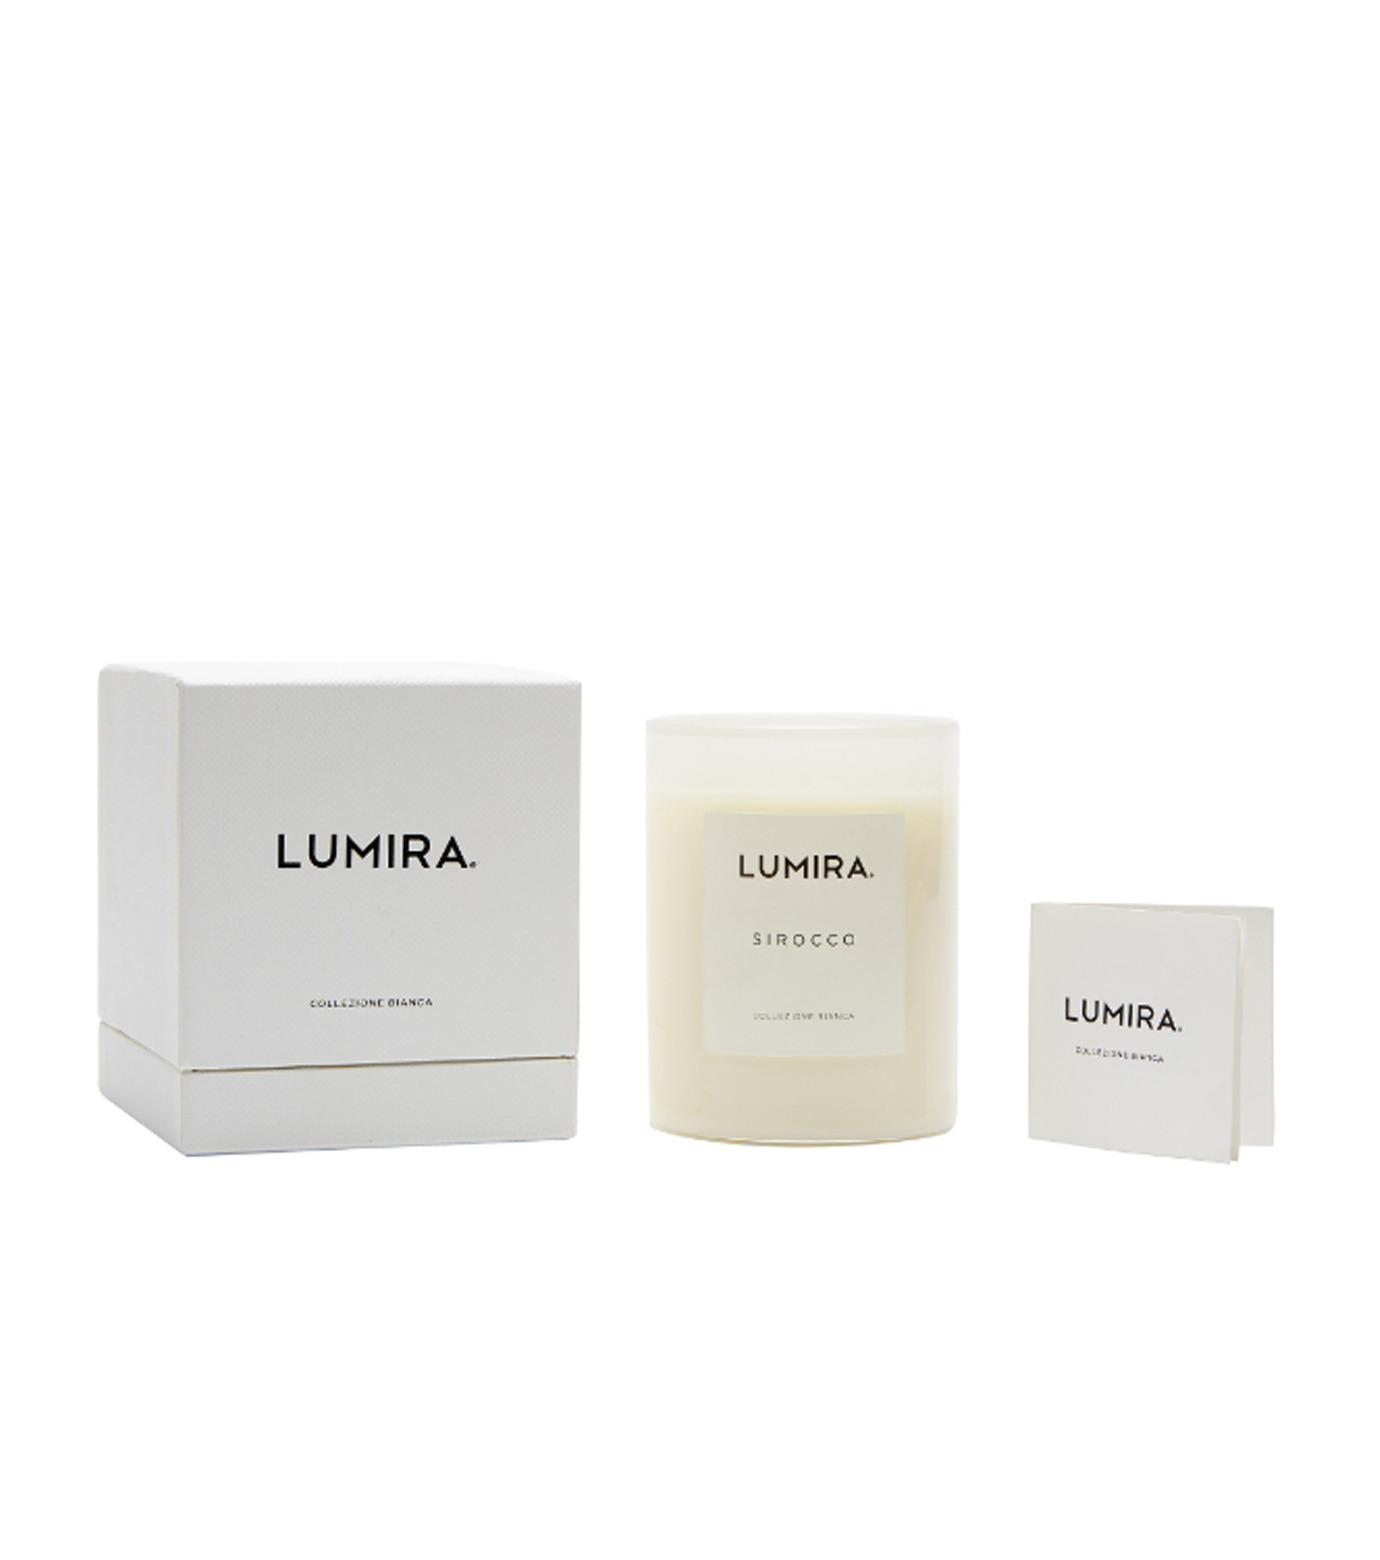 LUMIRA(ルミラ)のCollezione Bianca Sirocco-WHITE(キャンドル/candle)-103-CA-022-4 拡大詳細画像2